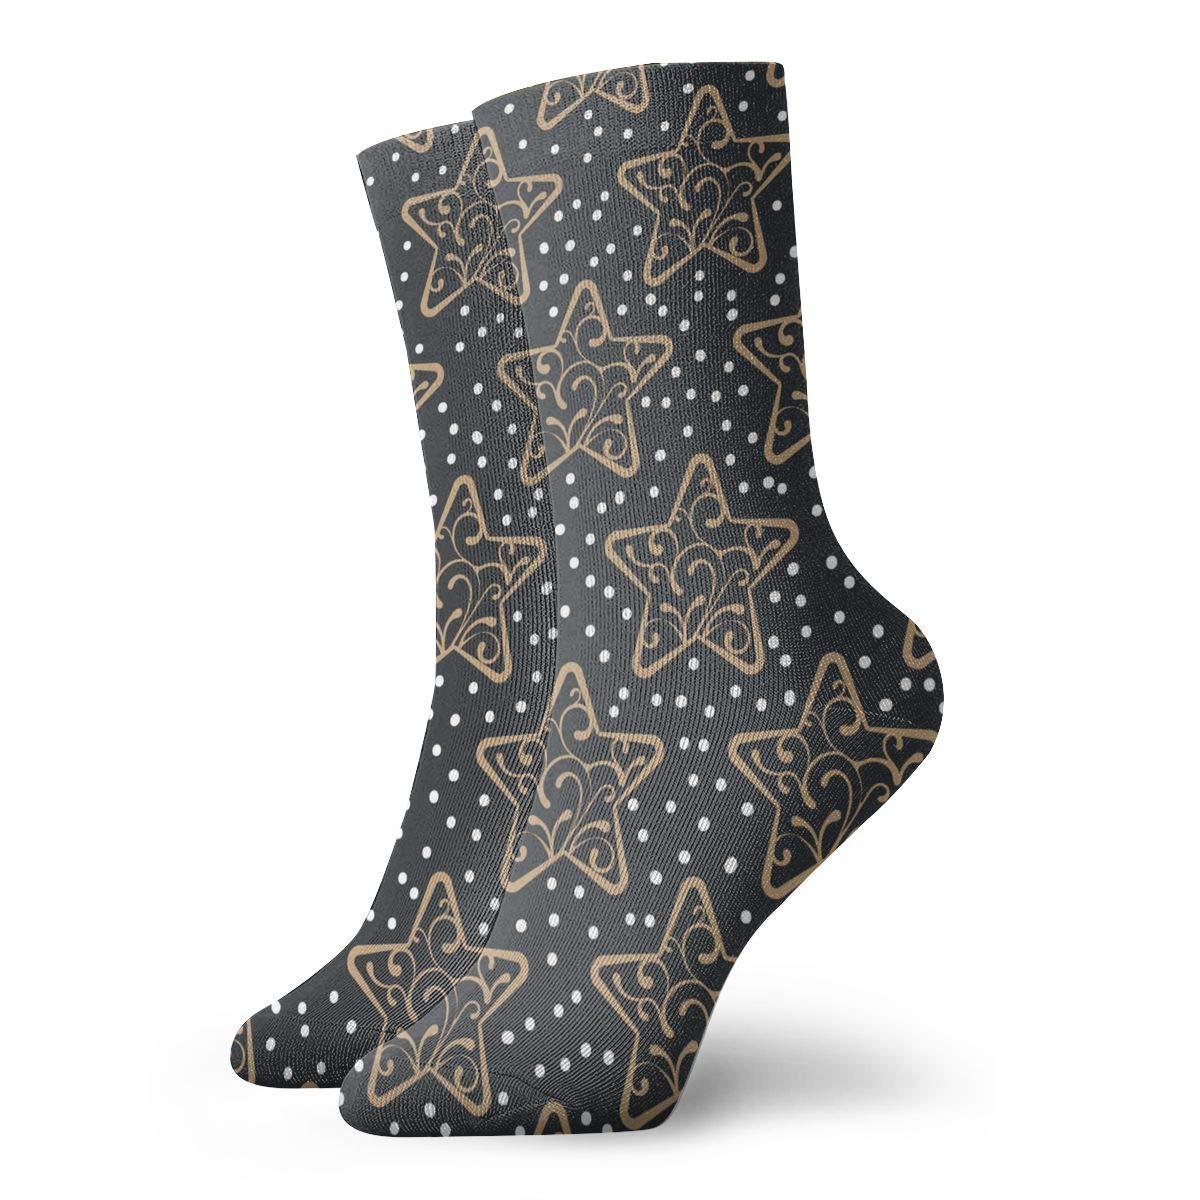 Star Snow Unisex Funny Casual Crew Socks Athletic Socks For Boys Girls Kids Teenagers